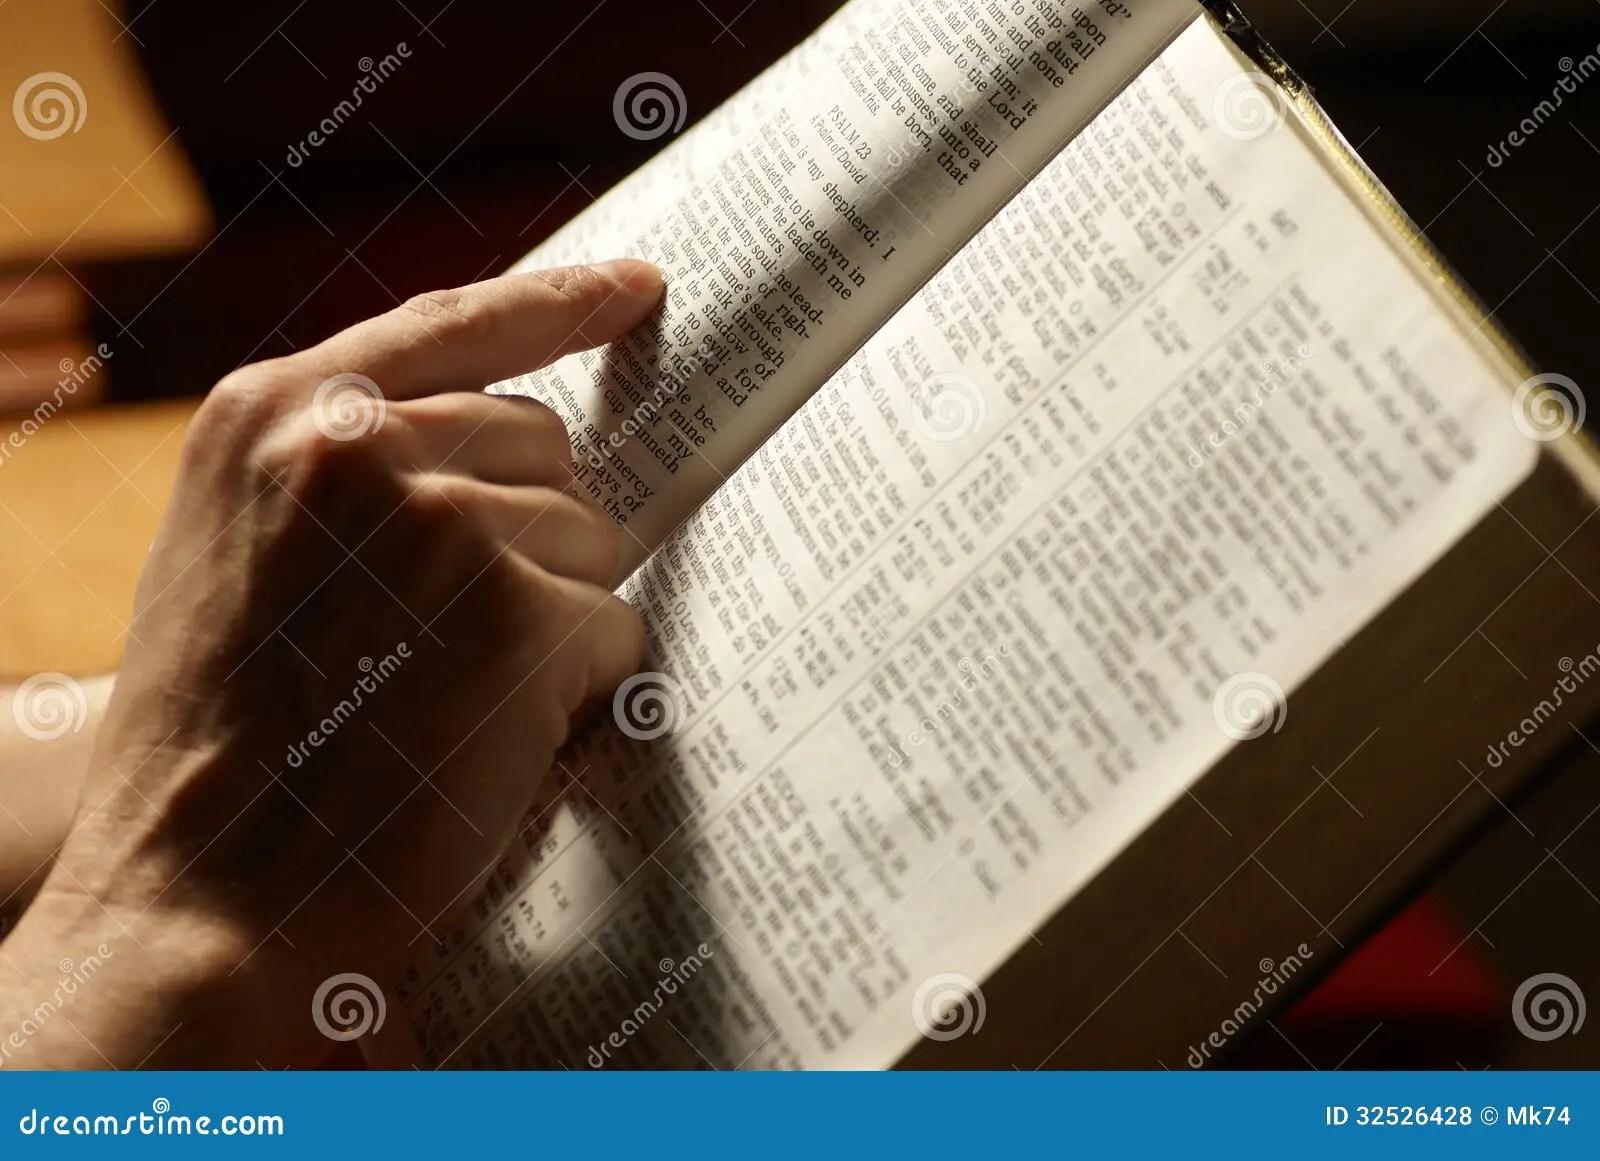 Reading Bible Stock Photo Image Of Horizontal